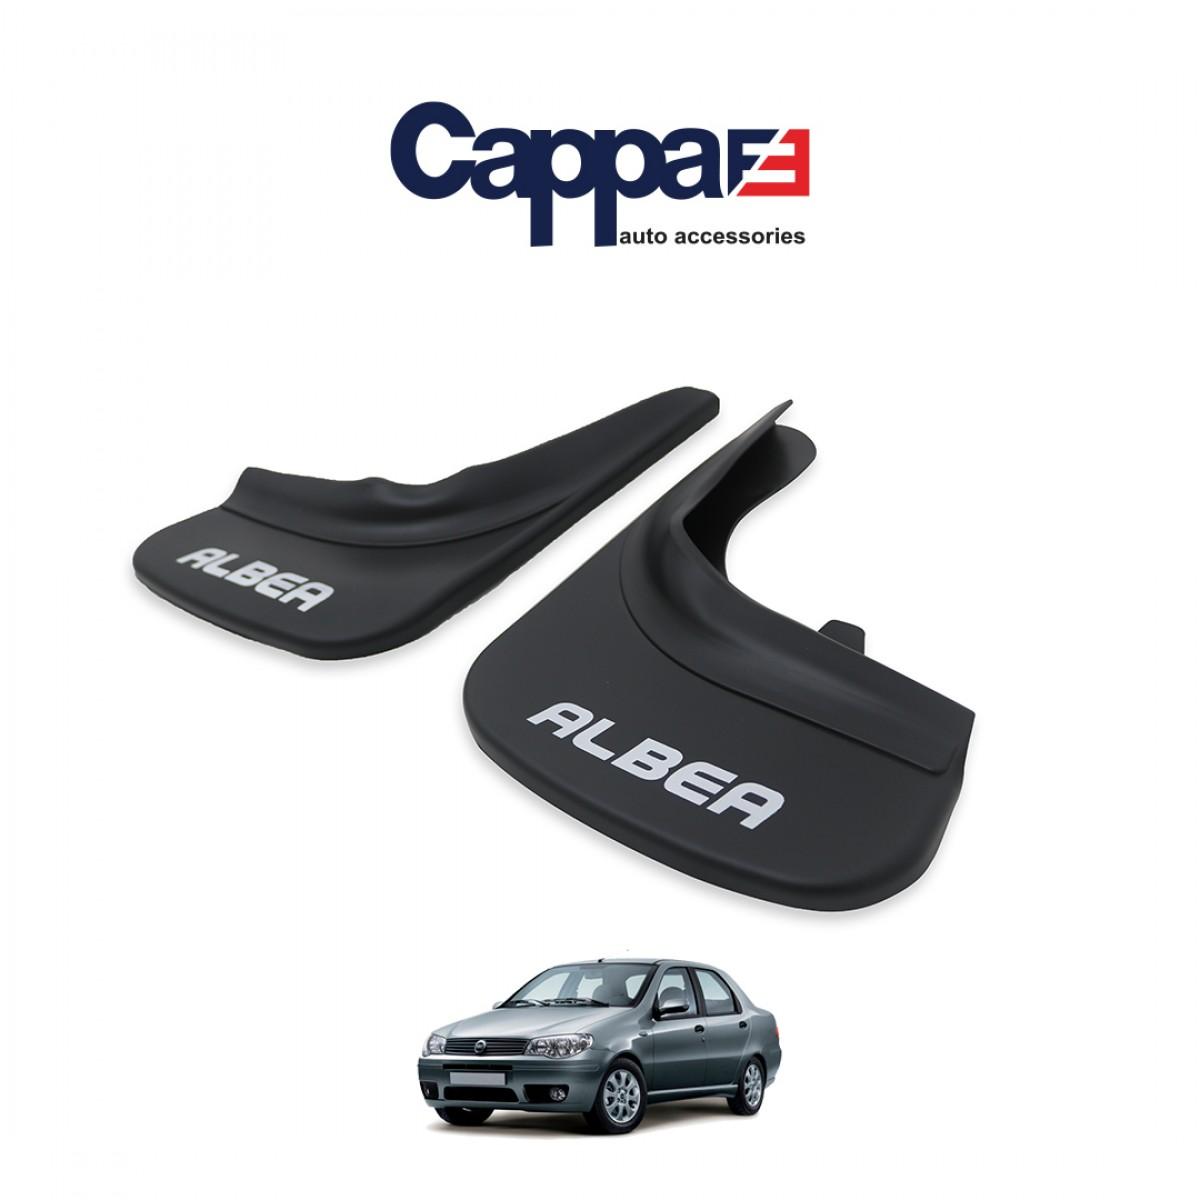 CAPPAFE Fiat Albea Paçalık Tozluk Set ABS 2 Prç Bütün Md. Uyumlu